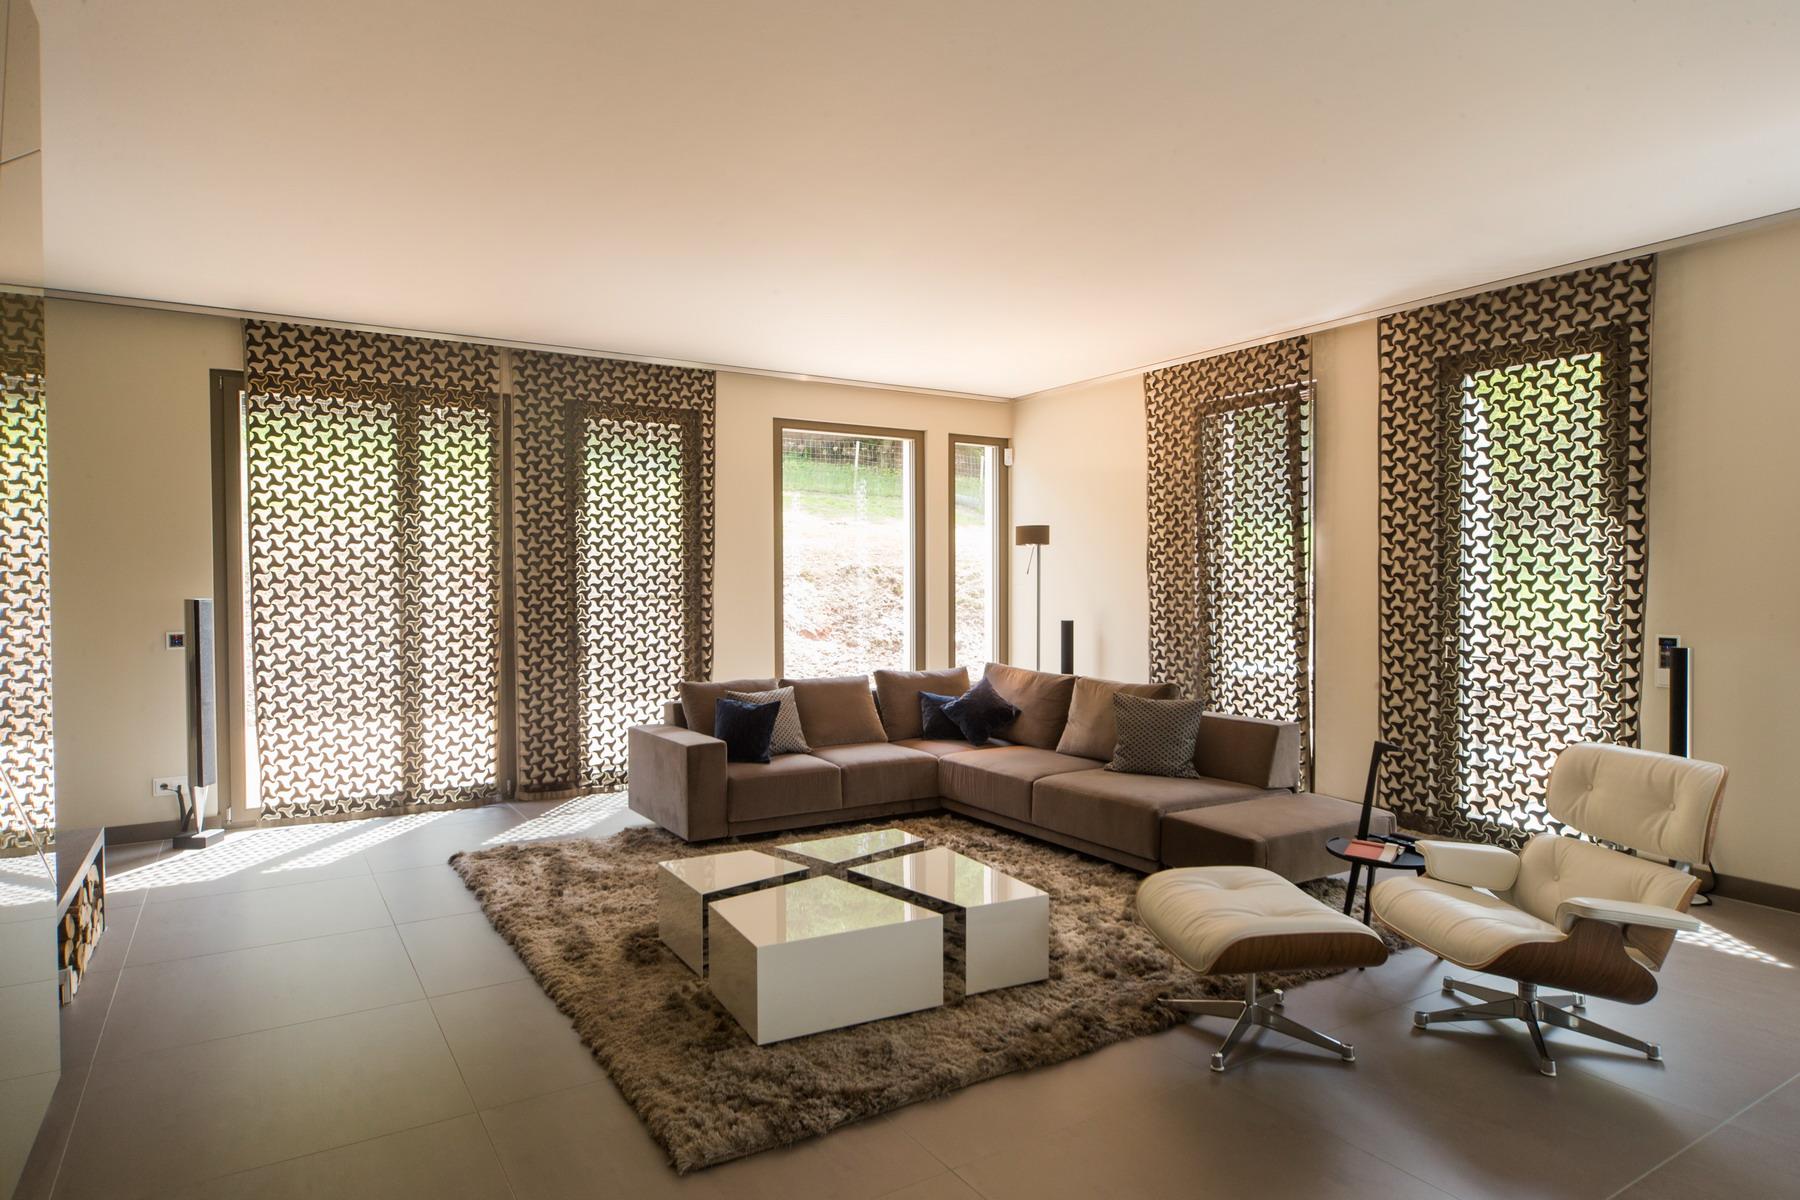 haus resch innenausbau. Black Bedroom Furniture Sets. Home Design Ideas